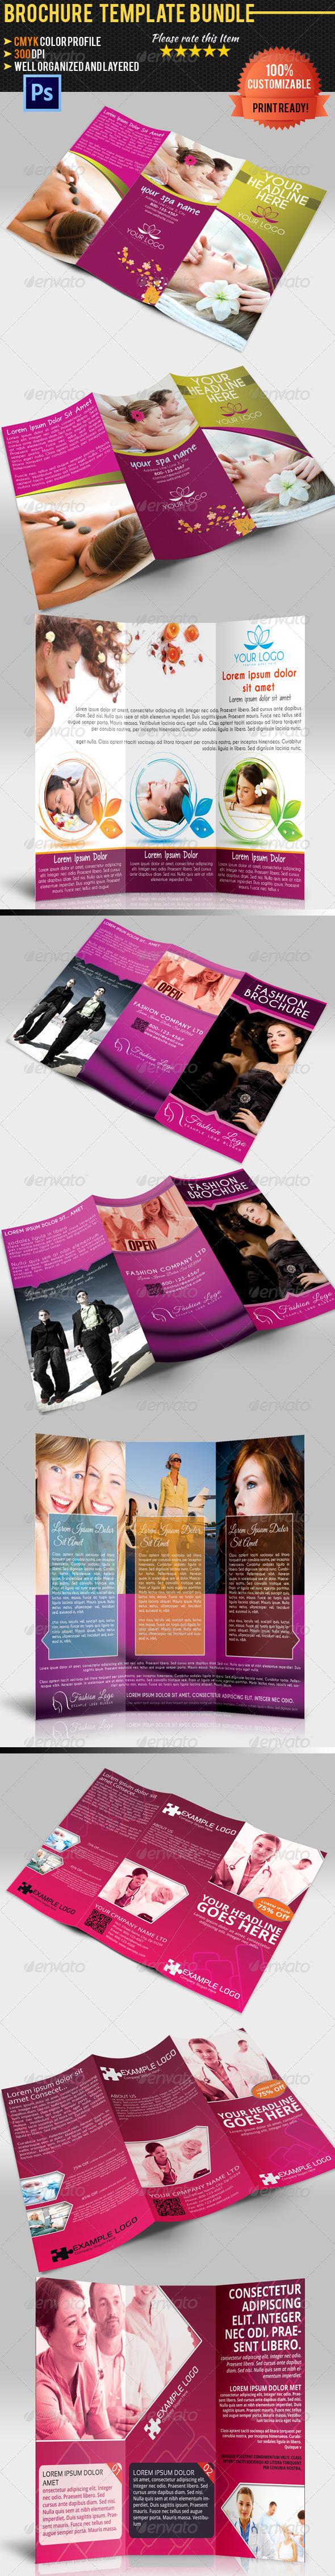 GraphicRiver Tri-Fold Brochure Bundle 5269767